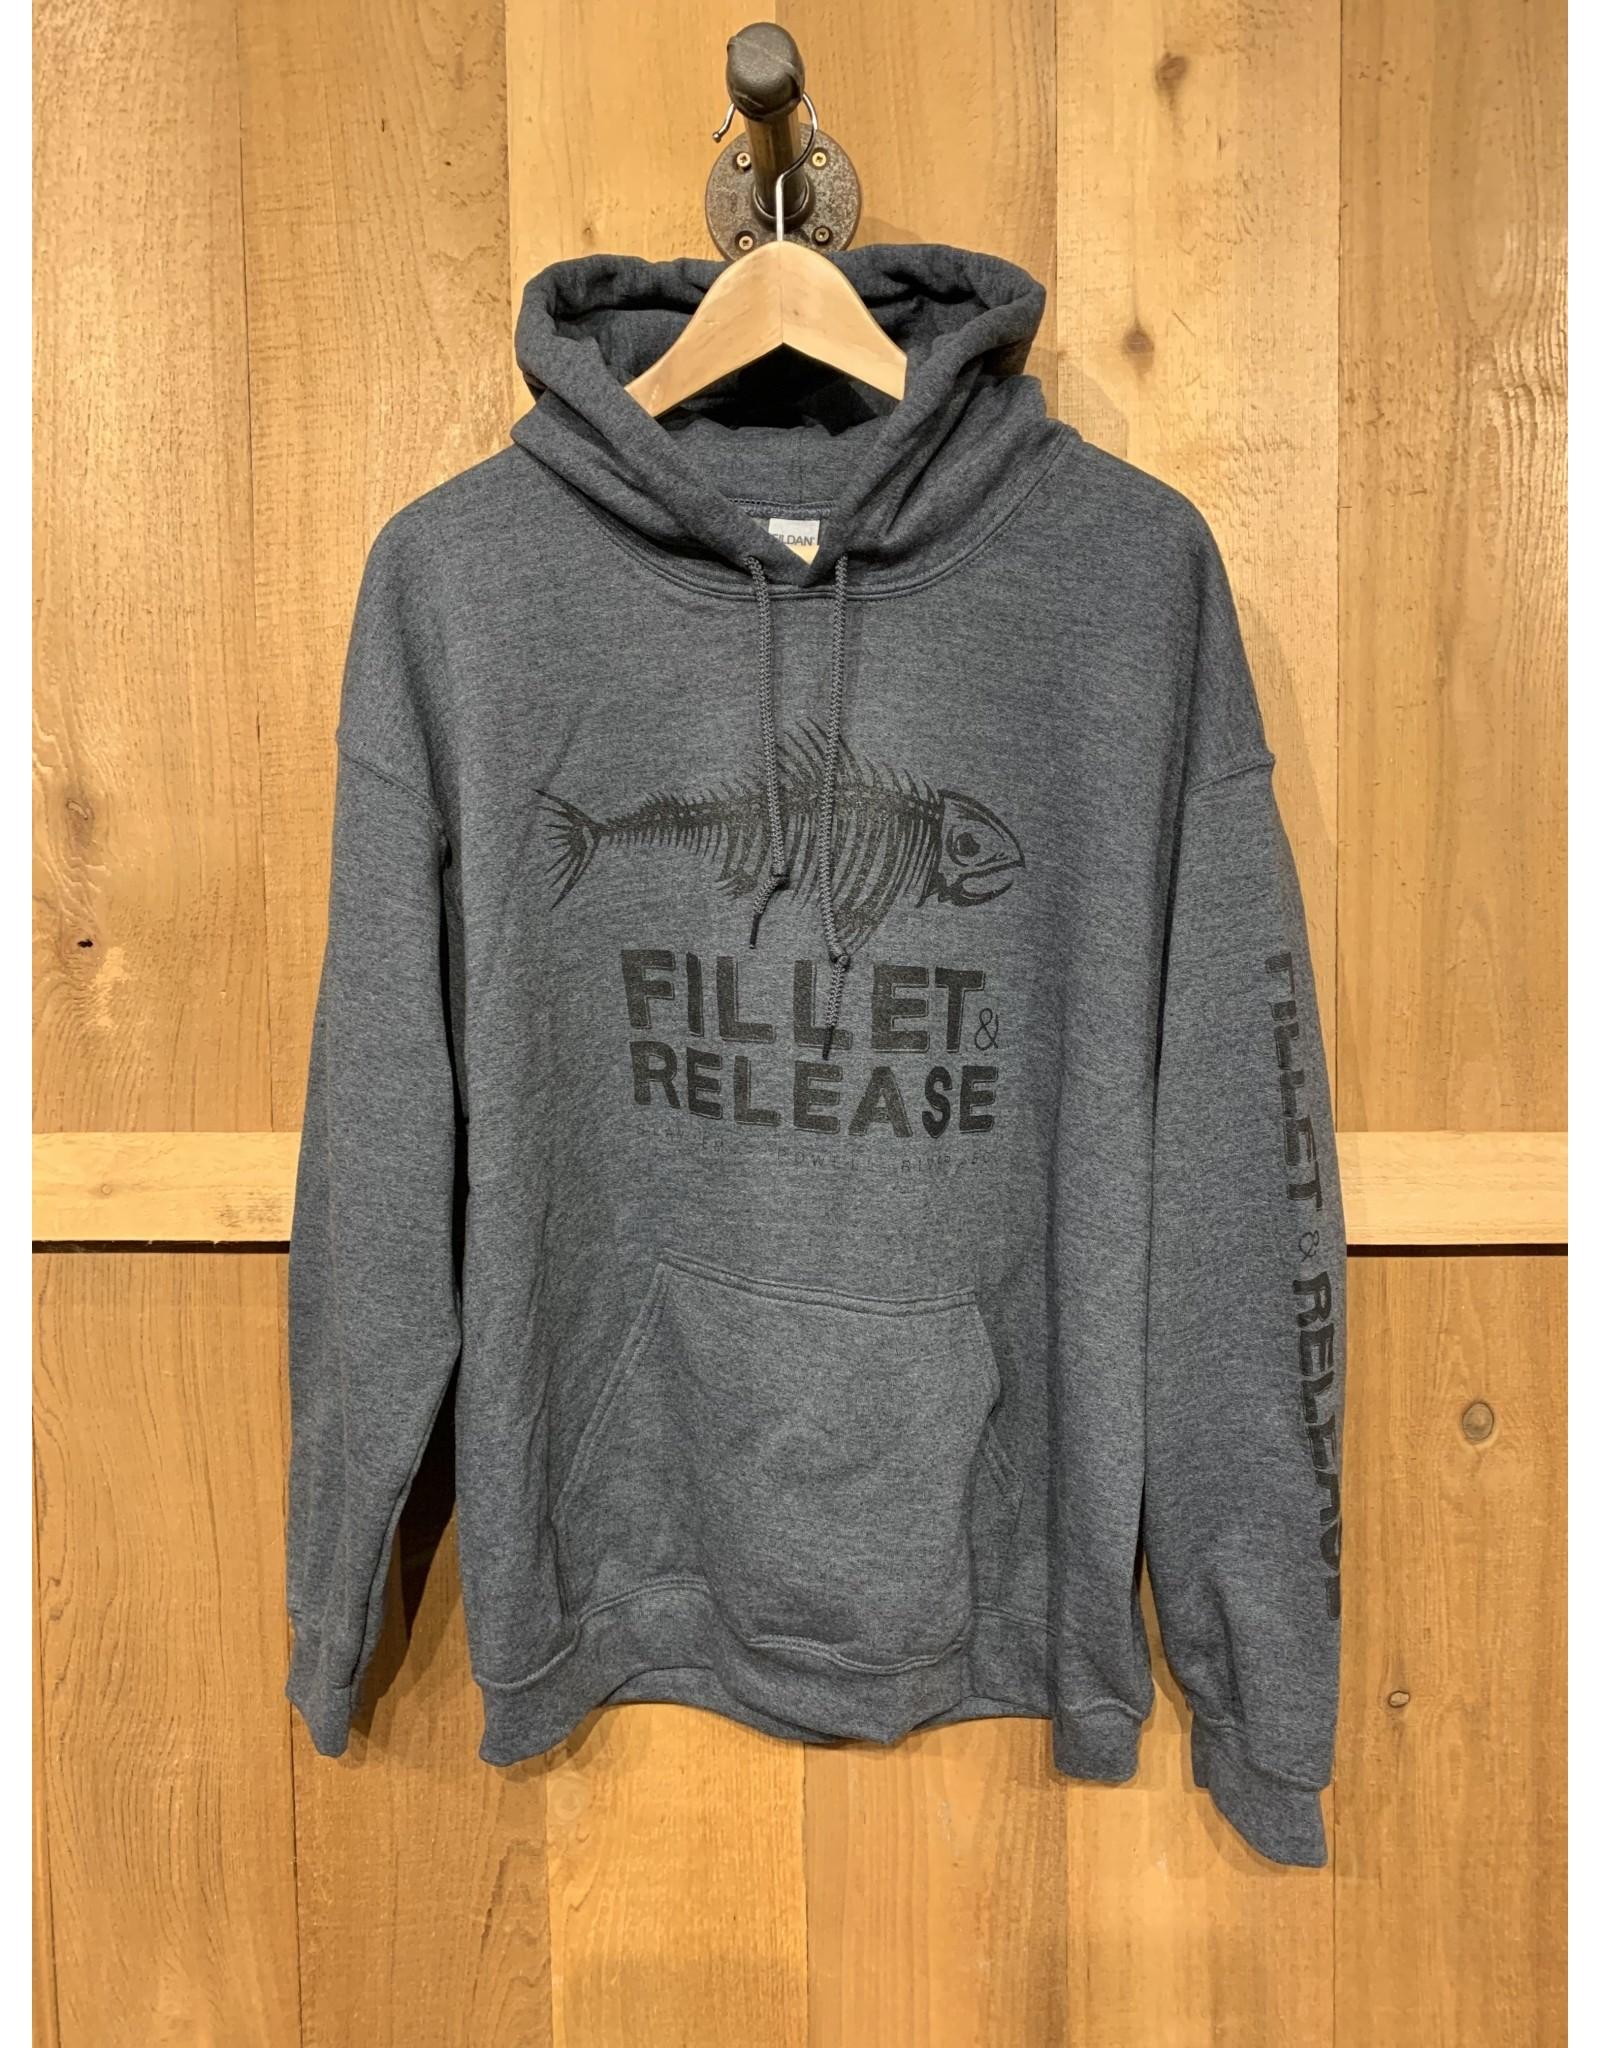 FILLET & RELEASE THE ORIGINAL FILLET & RELEASE GREY LIGHTWEIGHT HOODIE